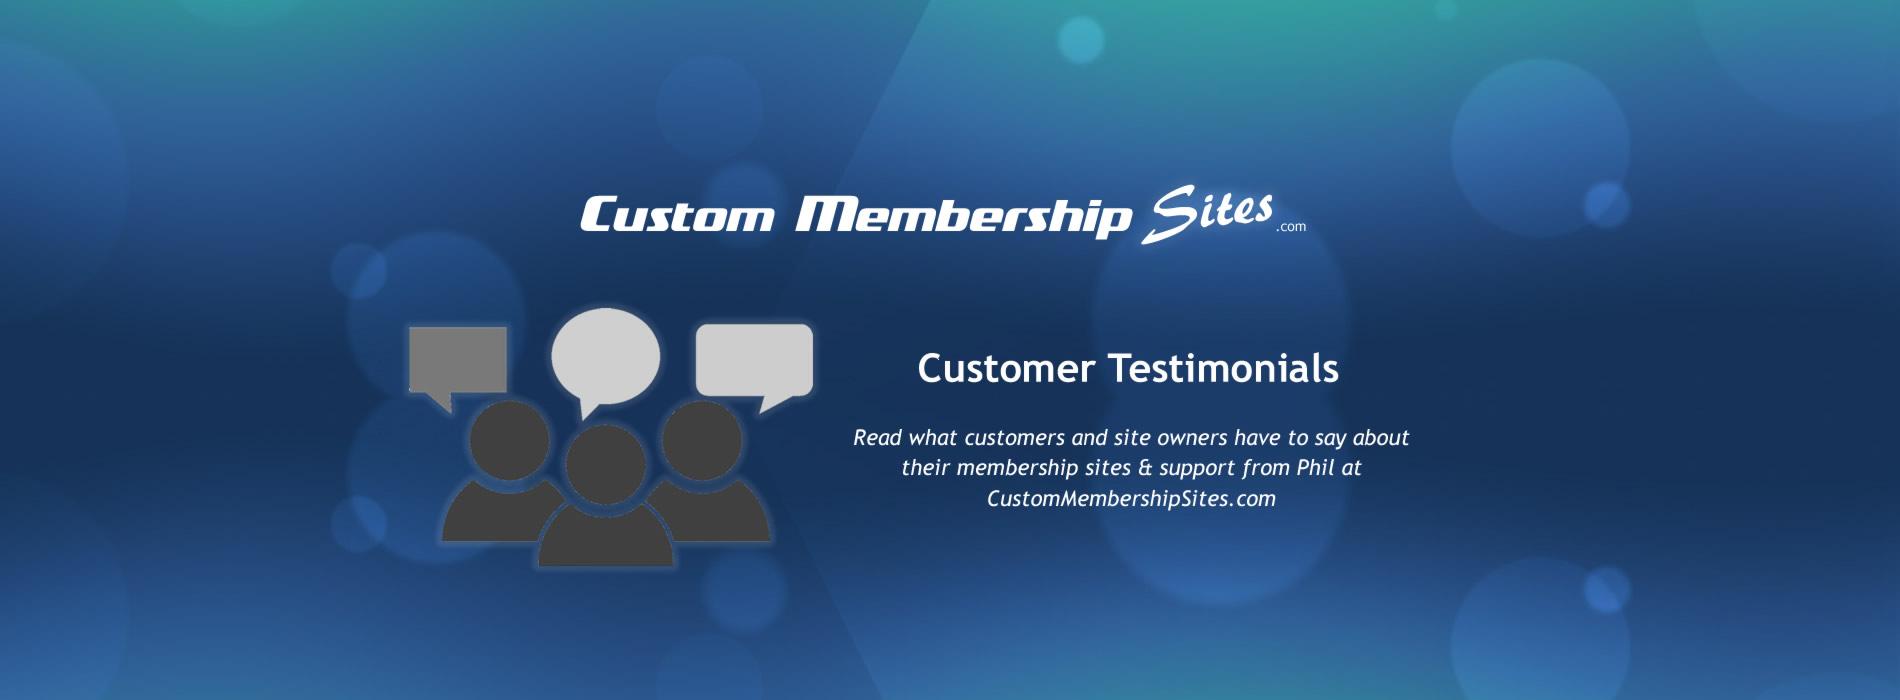 Membership Site Customer Testimonials